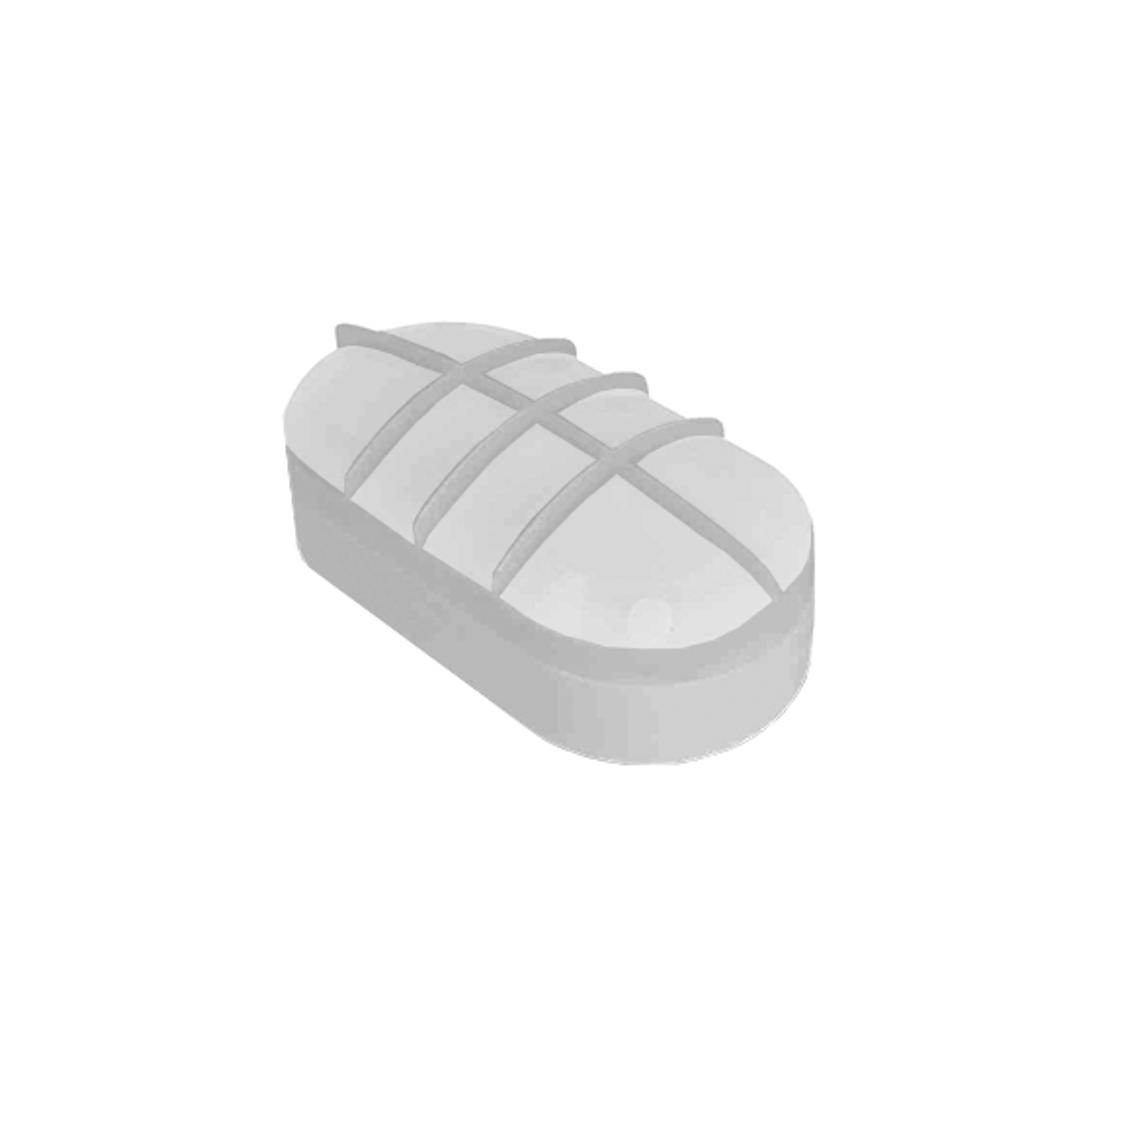 Luxtartaruga 150 X 80 / 7W Sobrepor